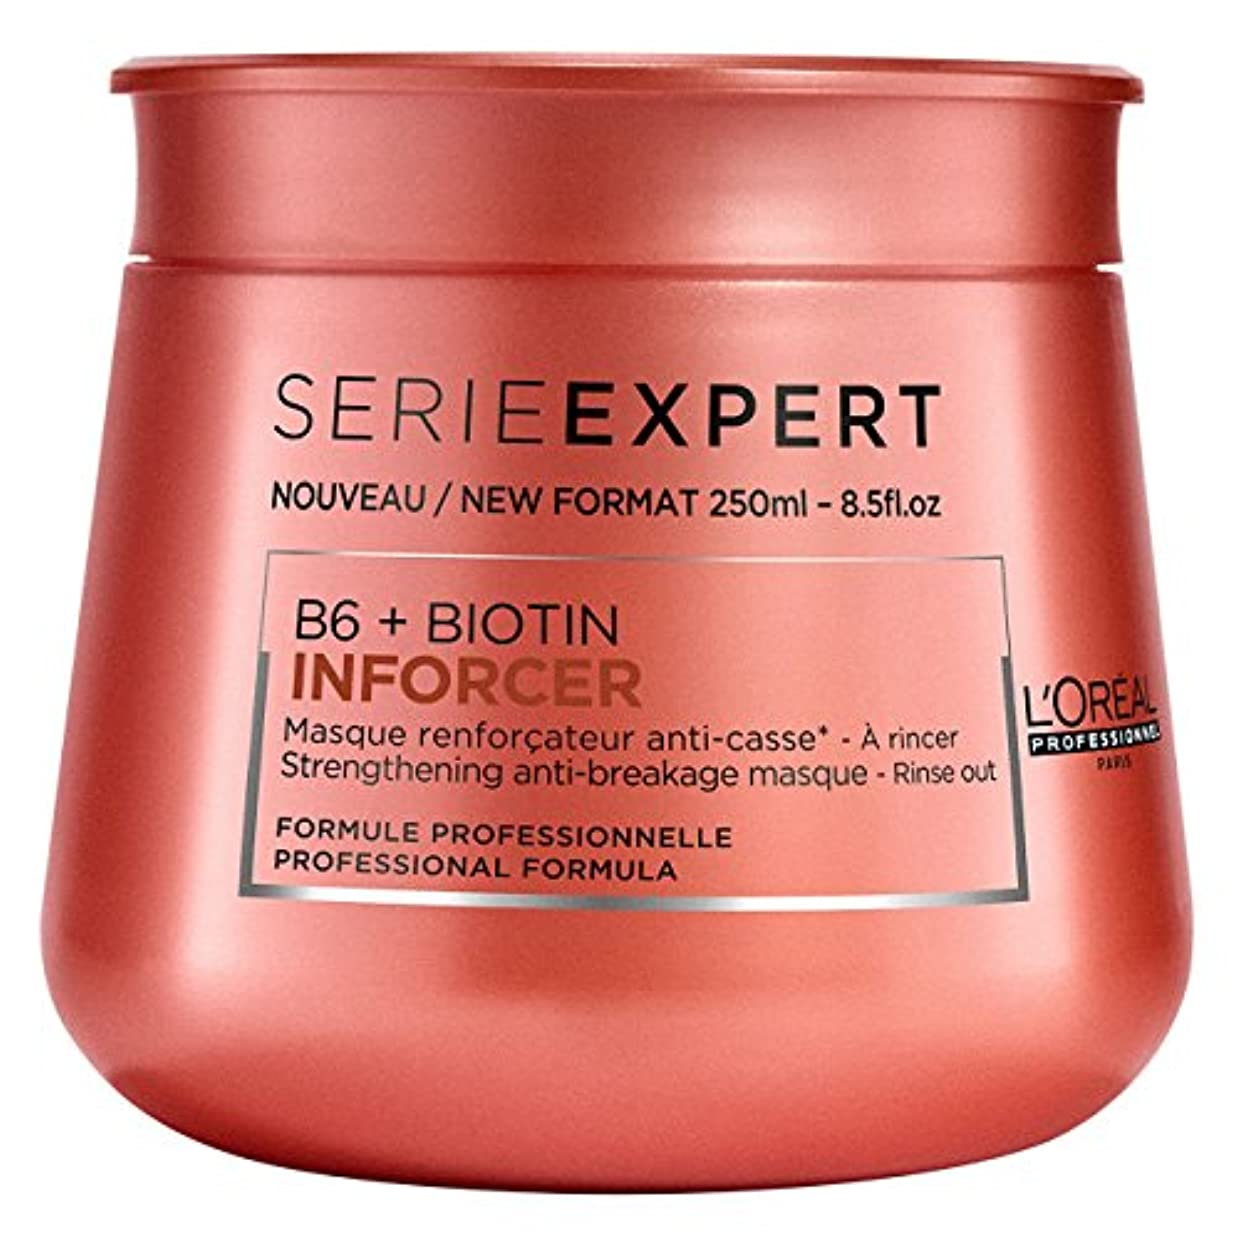 犠牲前投薬妖精L'Oreal Serie Expert B6 + Biotin INFORCER Strengthening Anti-Breakage Masque 250 ml [並行輸入品]